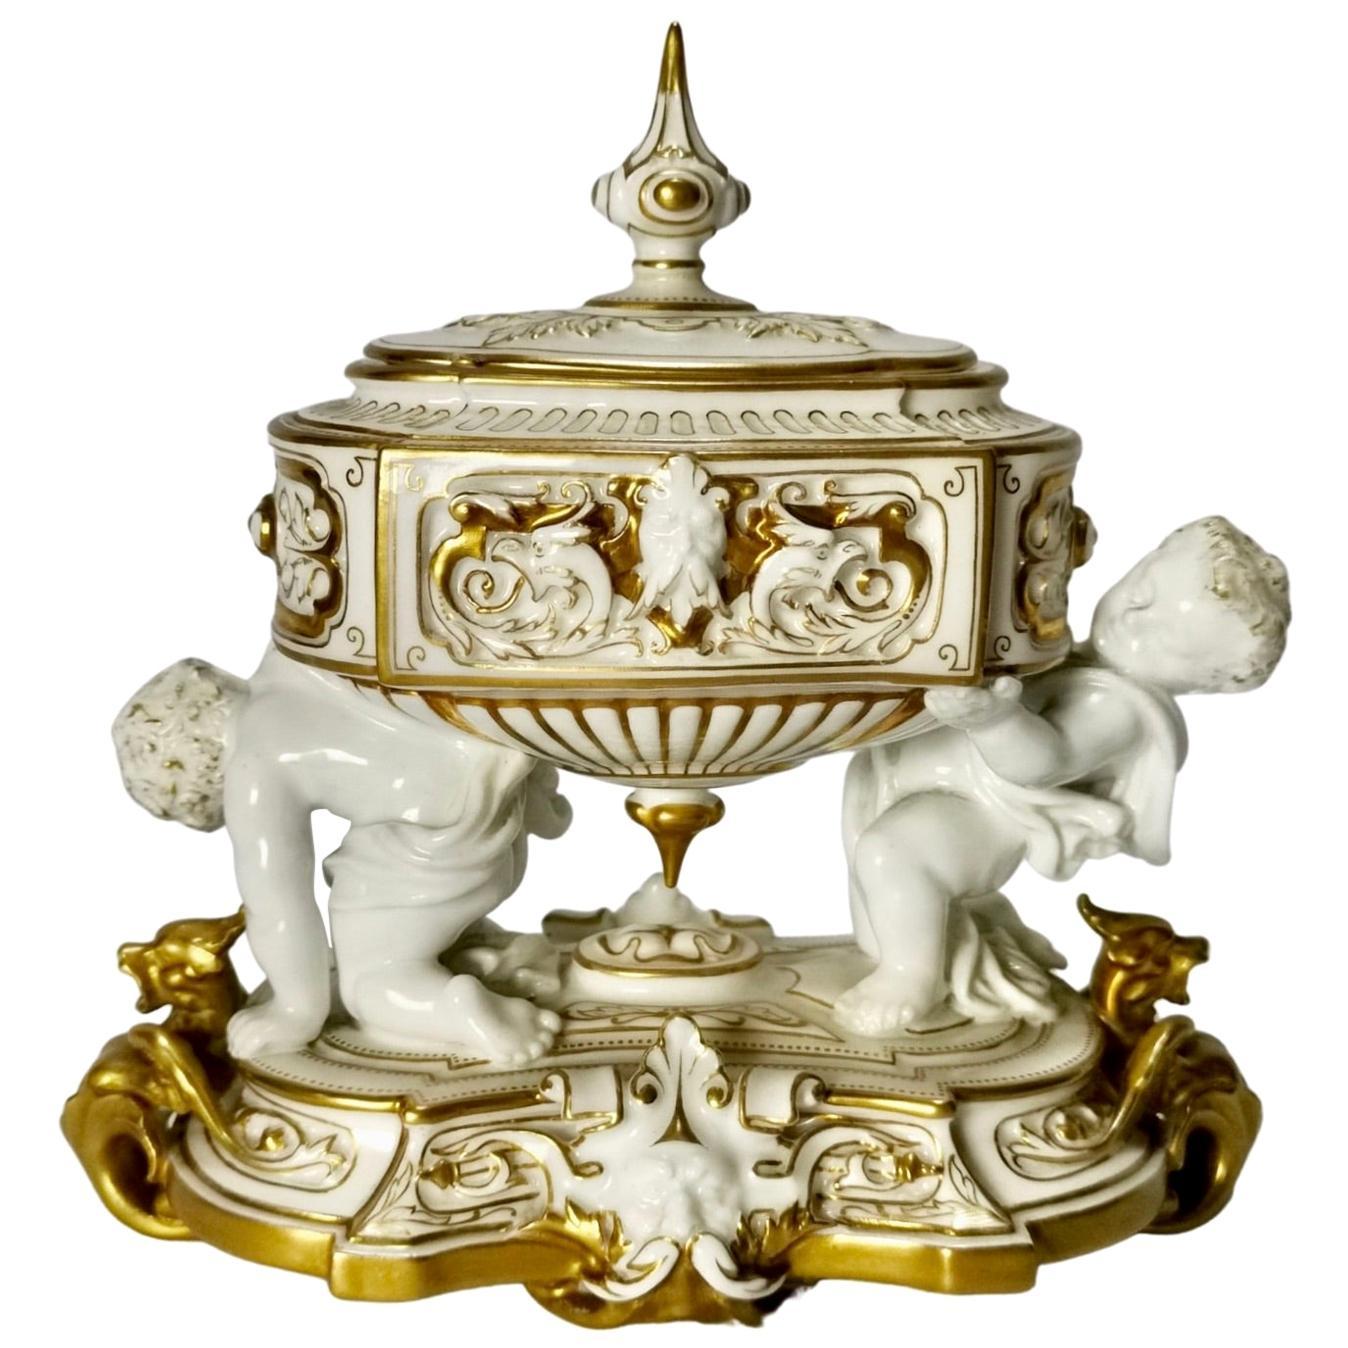 Royal Stamp Box, White Porcelain, Gilt, Cherubs, Royal Worcester, Edwardian 1902